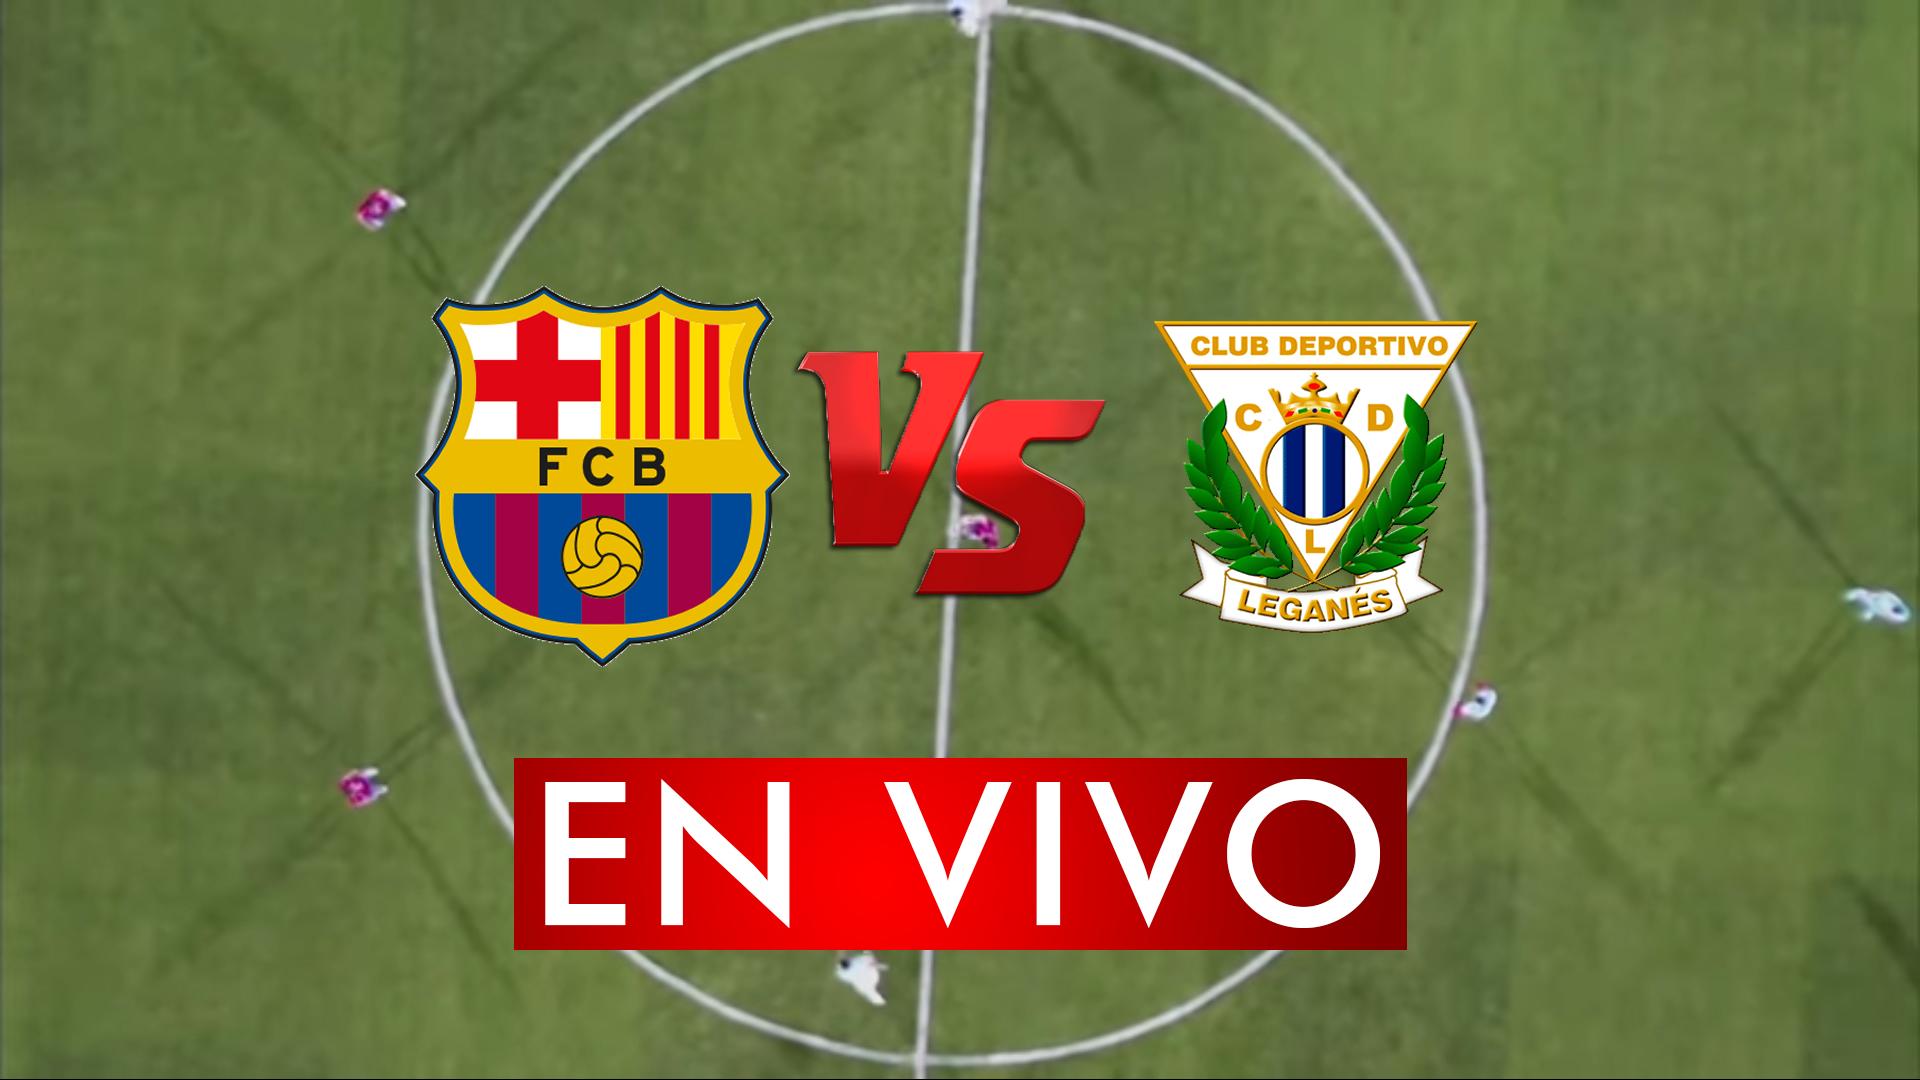 Barcelona vs Leganés en VIVO ONLINE HOY 30 ENERO 2020